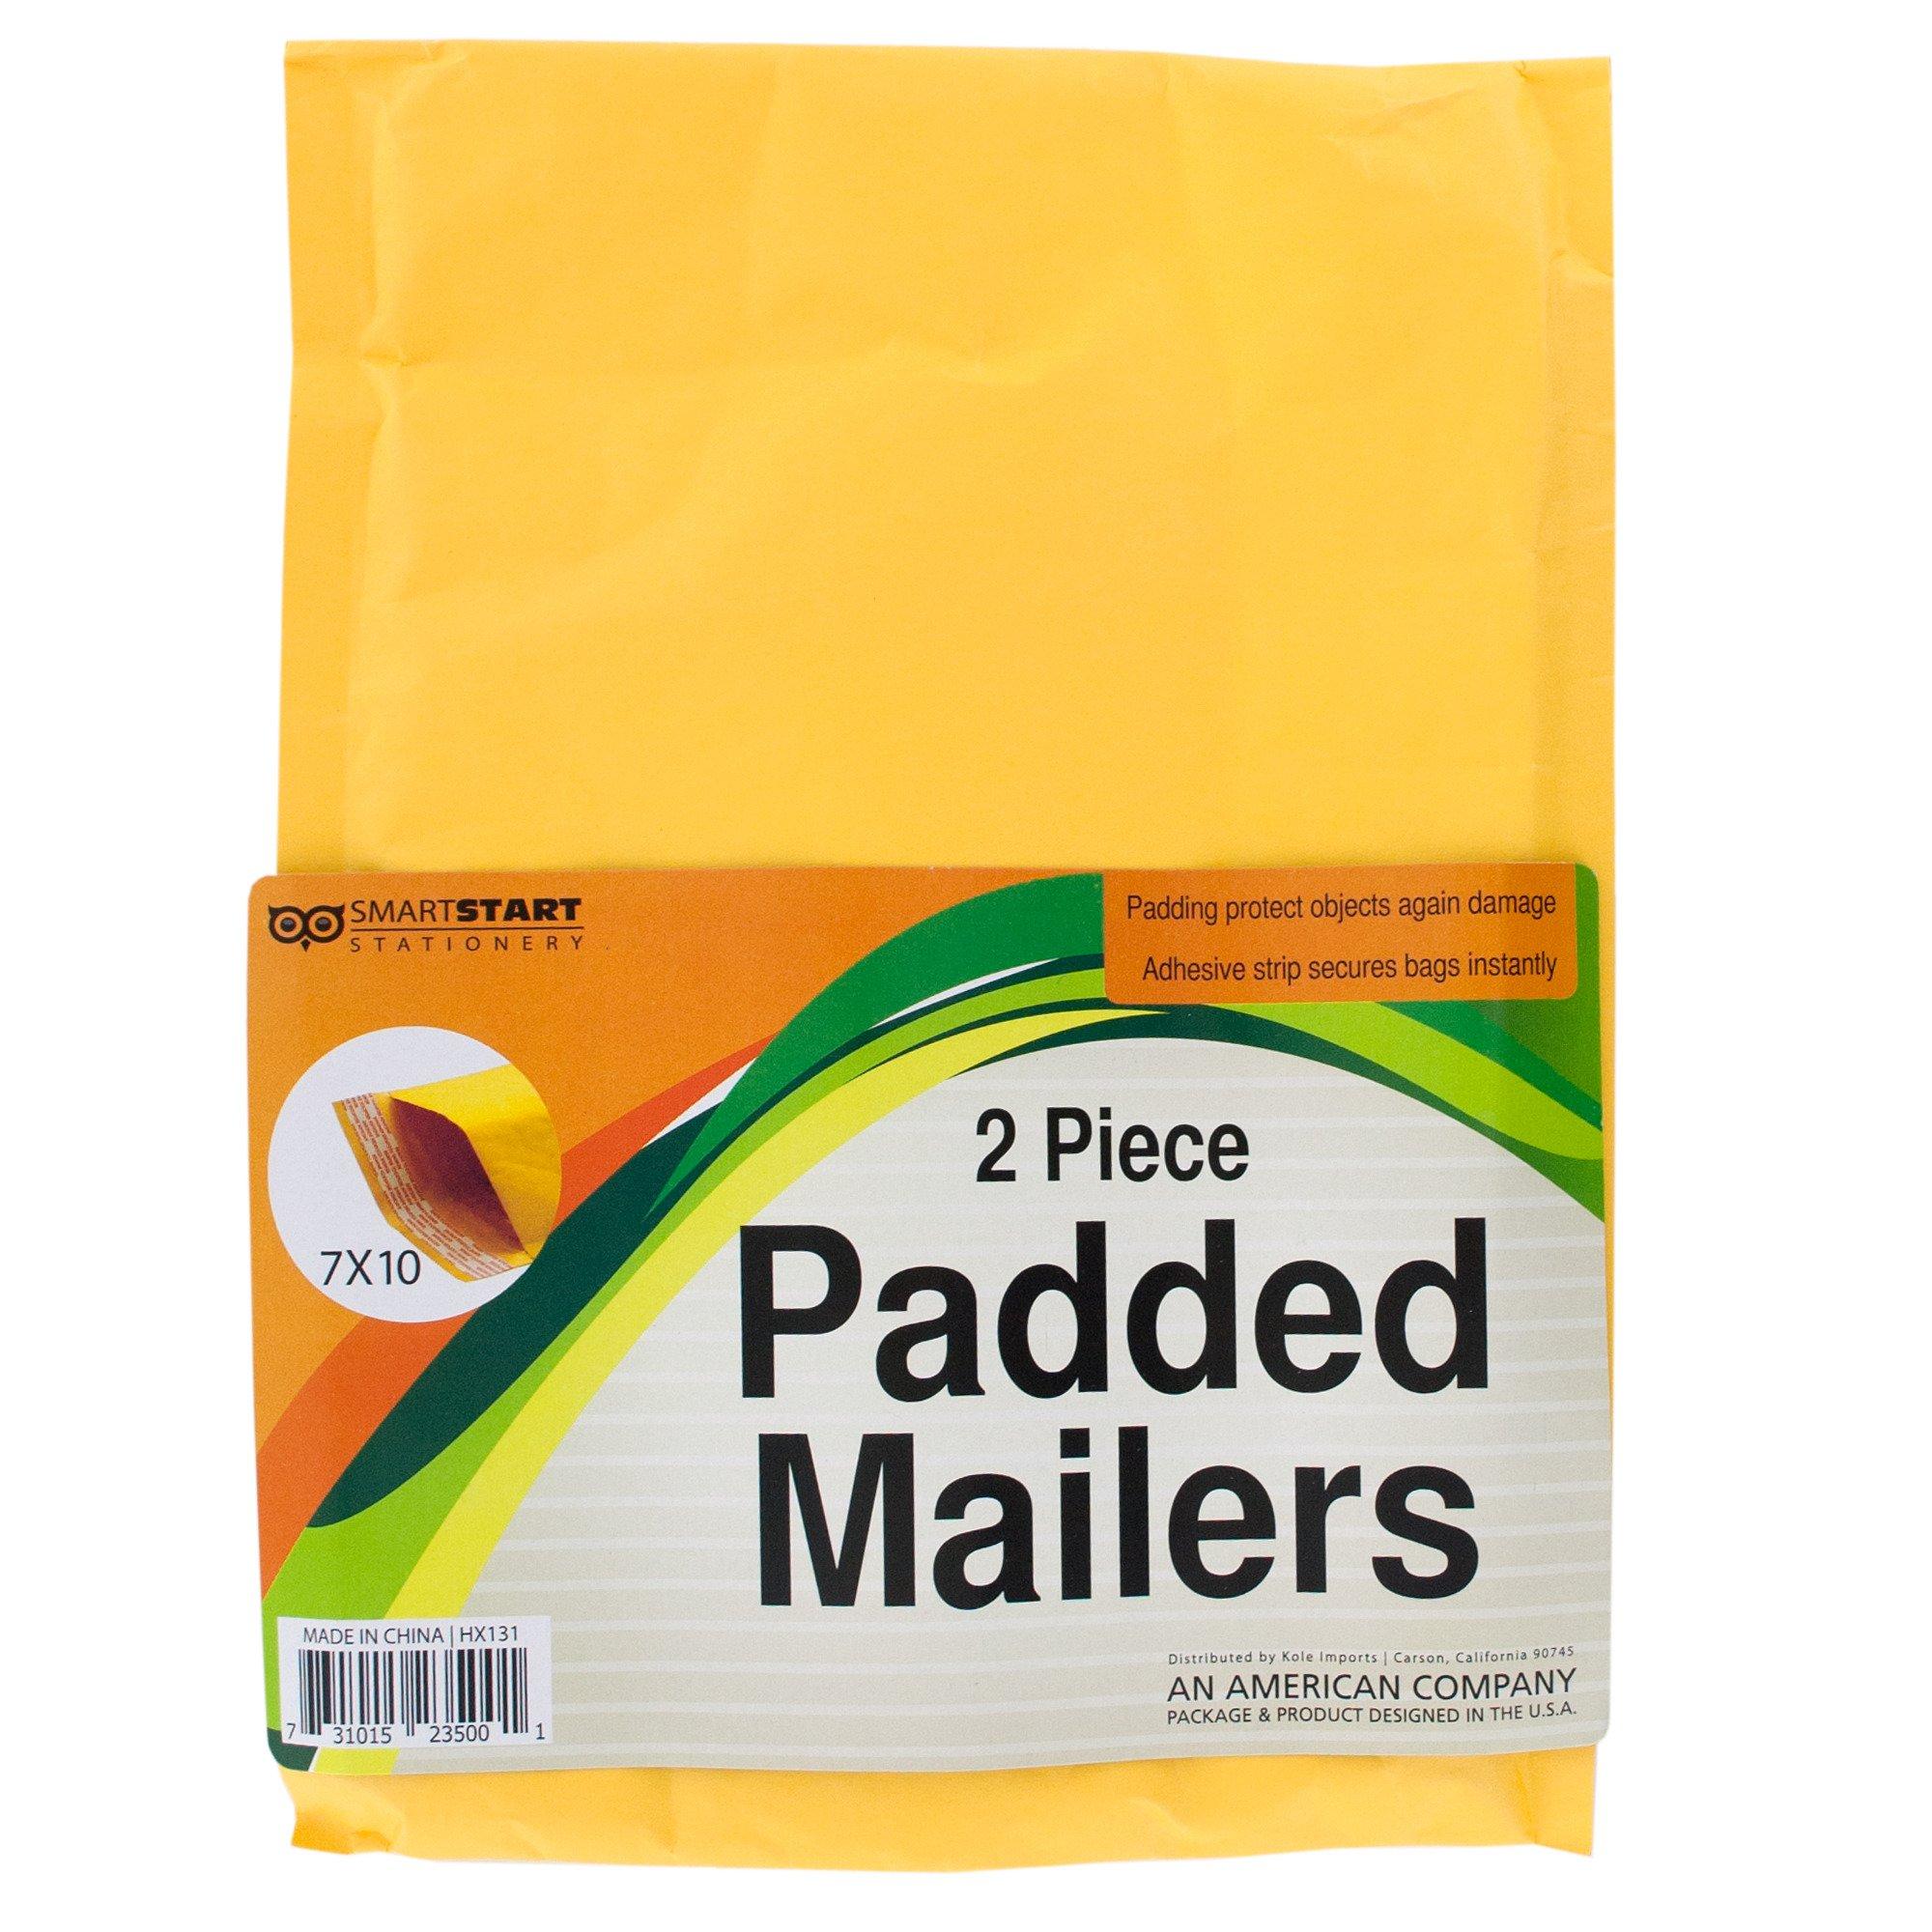 123-Wholesale - Set of 36 Medium Padded Mailers - School & Office Supplies Envelopes